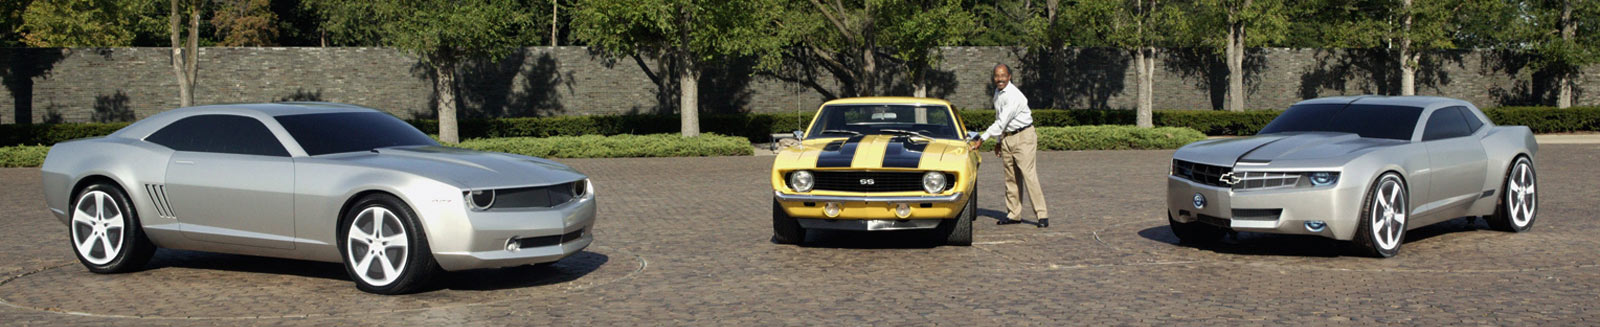 Chevrolet%20Camaro%20Concept%20prototypes%20lg.jpg